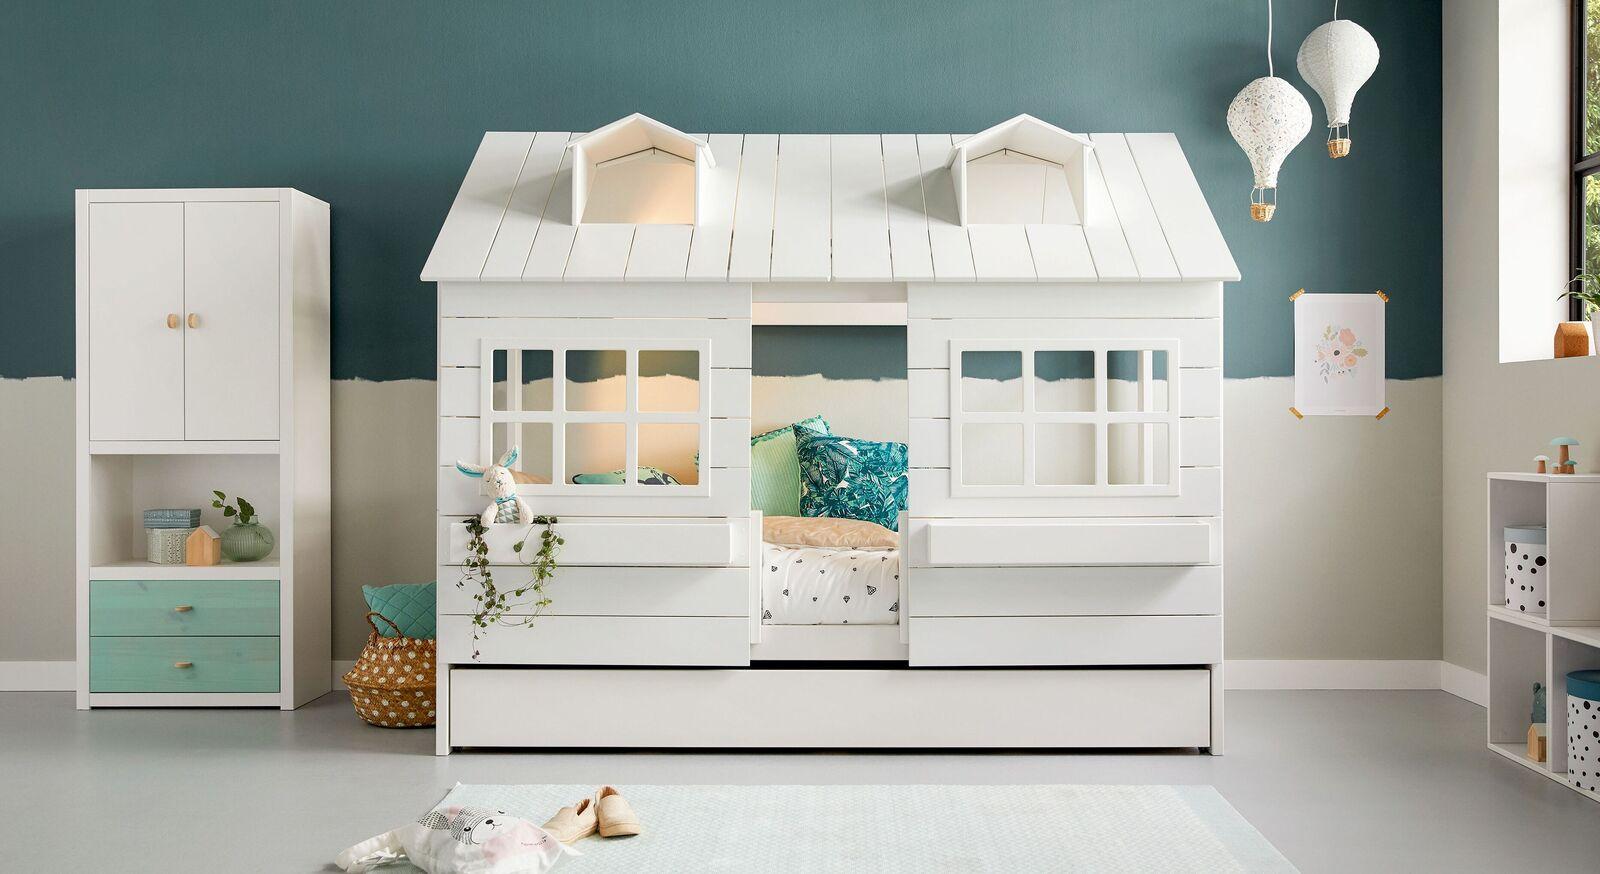 Modernes LIFETIME Hüttenbett Lakehouse mit Fenster